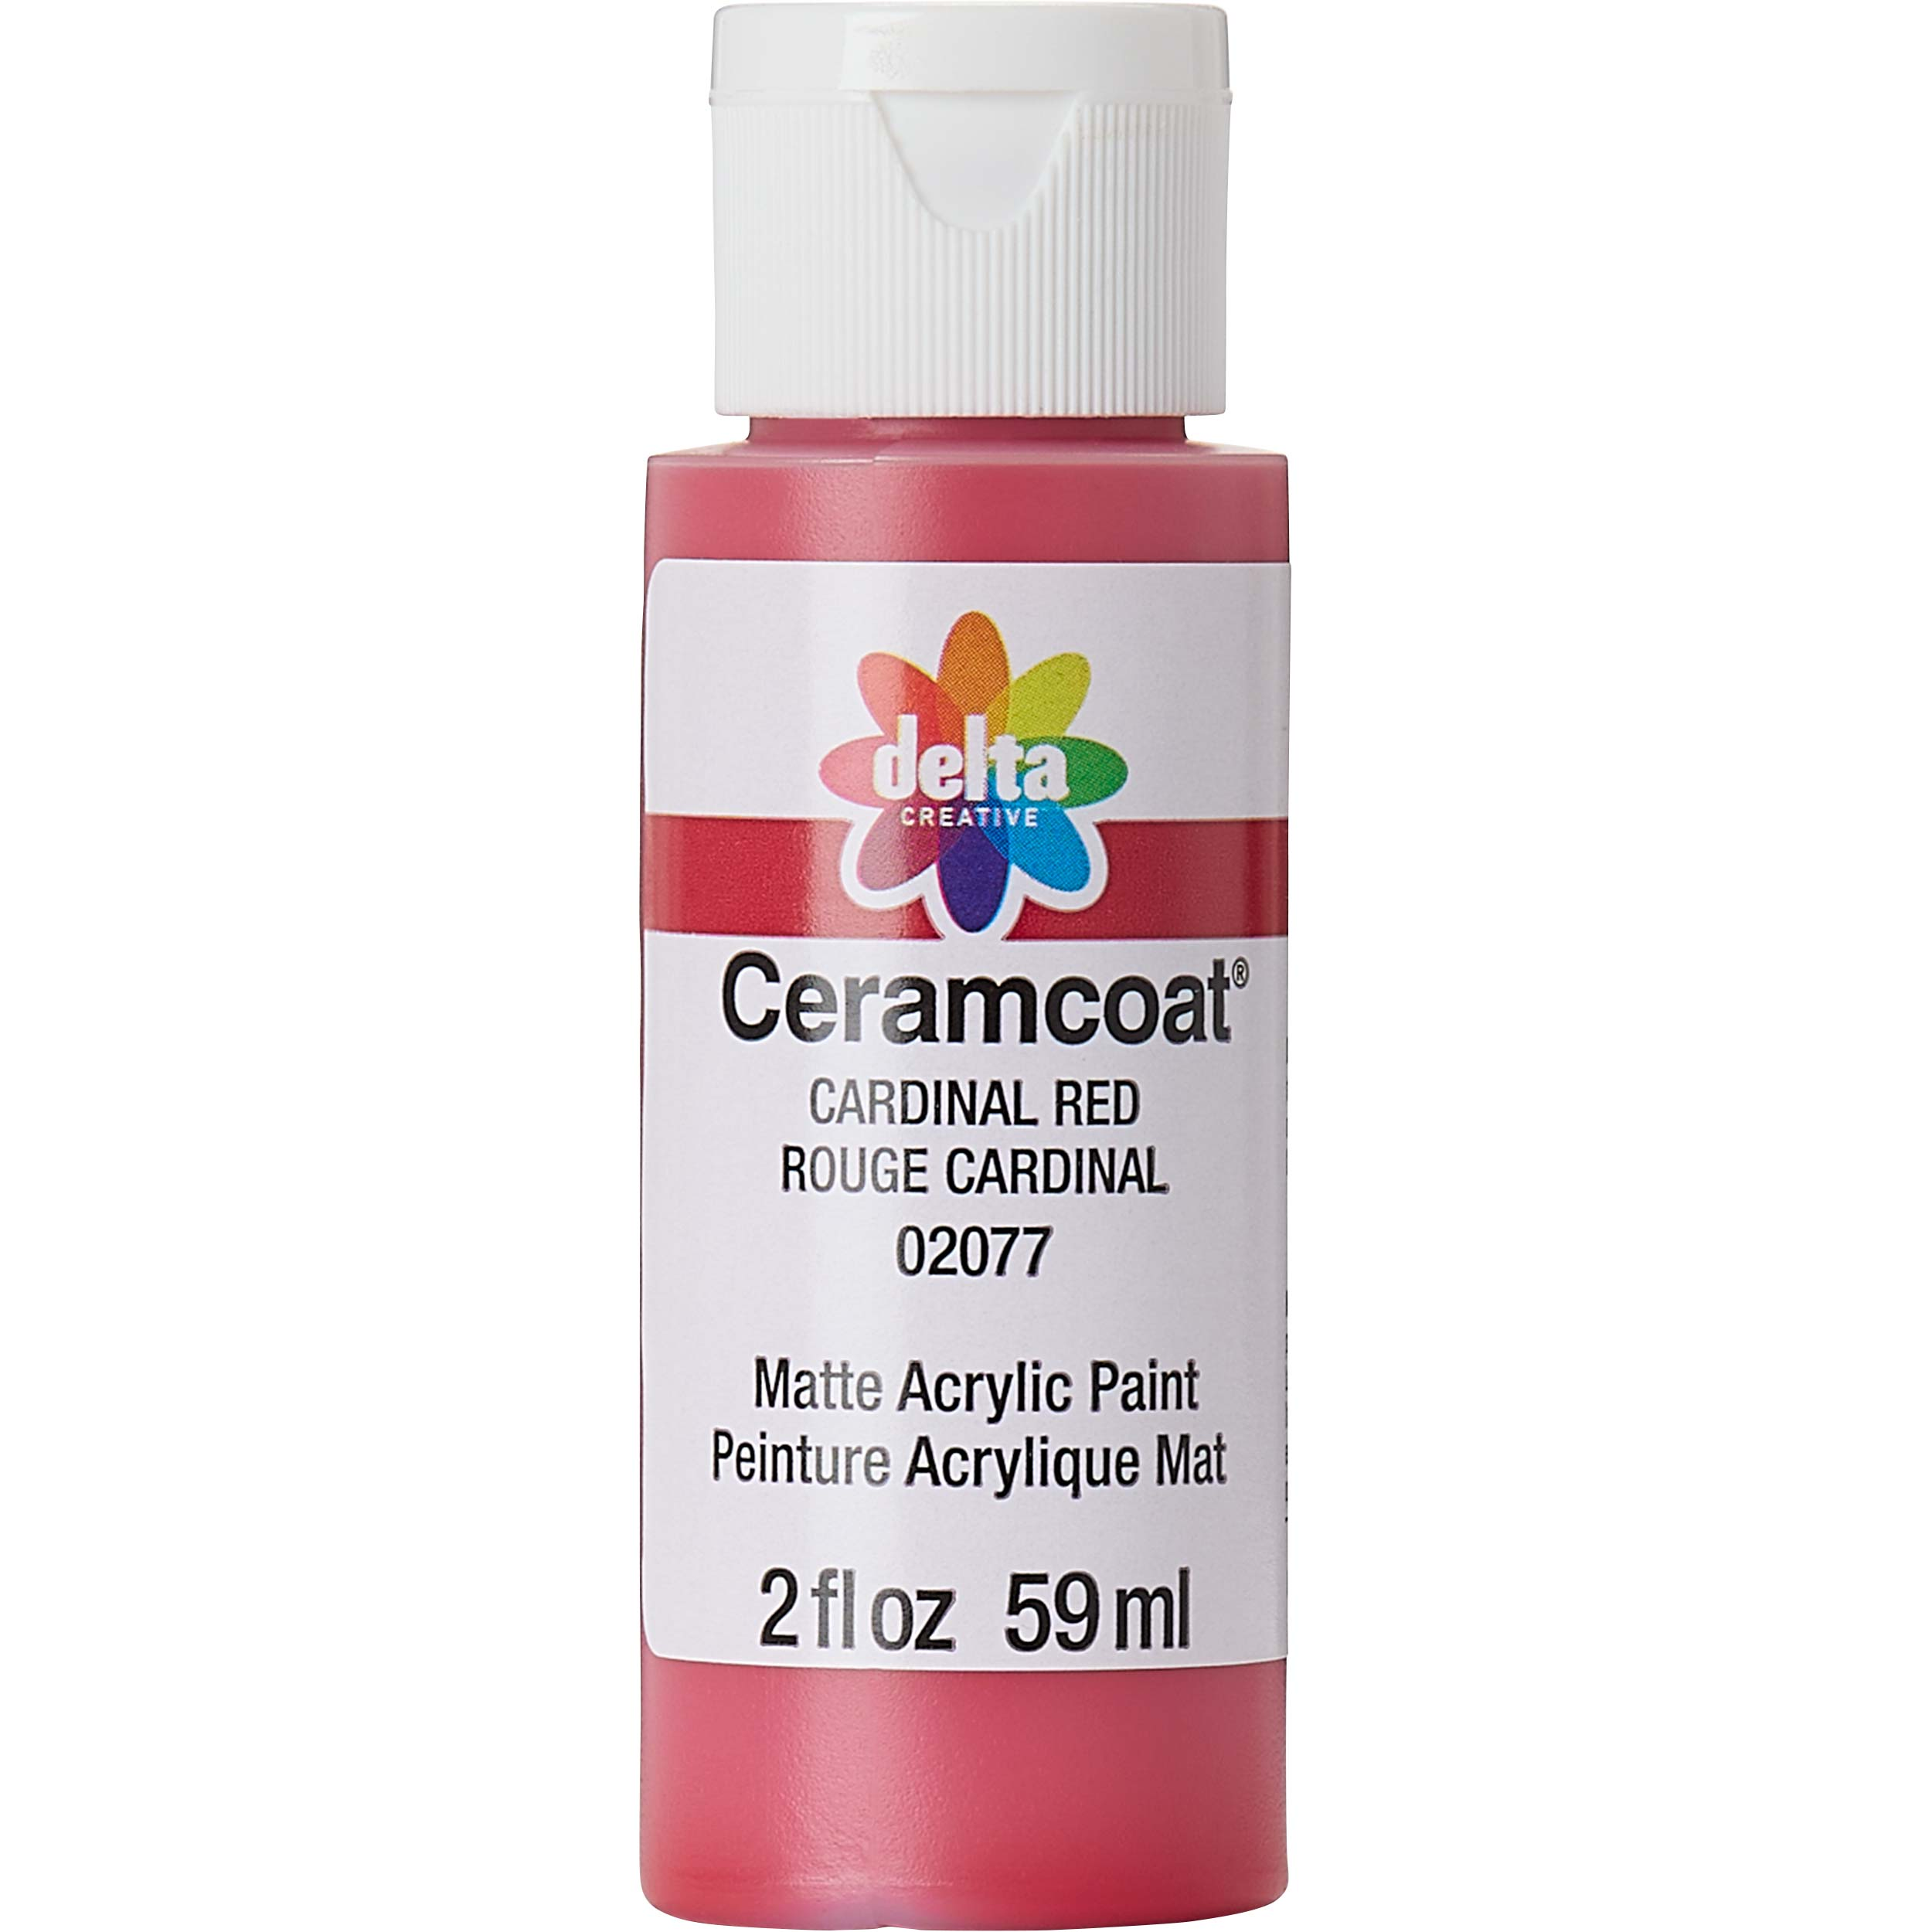 Delta Ceramcoat ® Acrylic Paint - Cardinal Red, 2 oz.